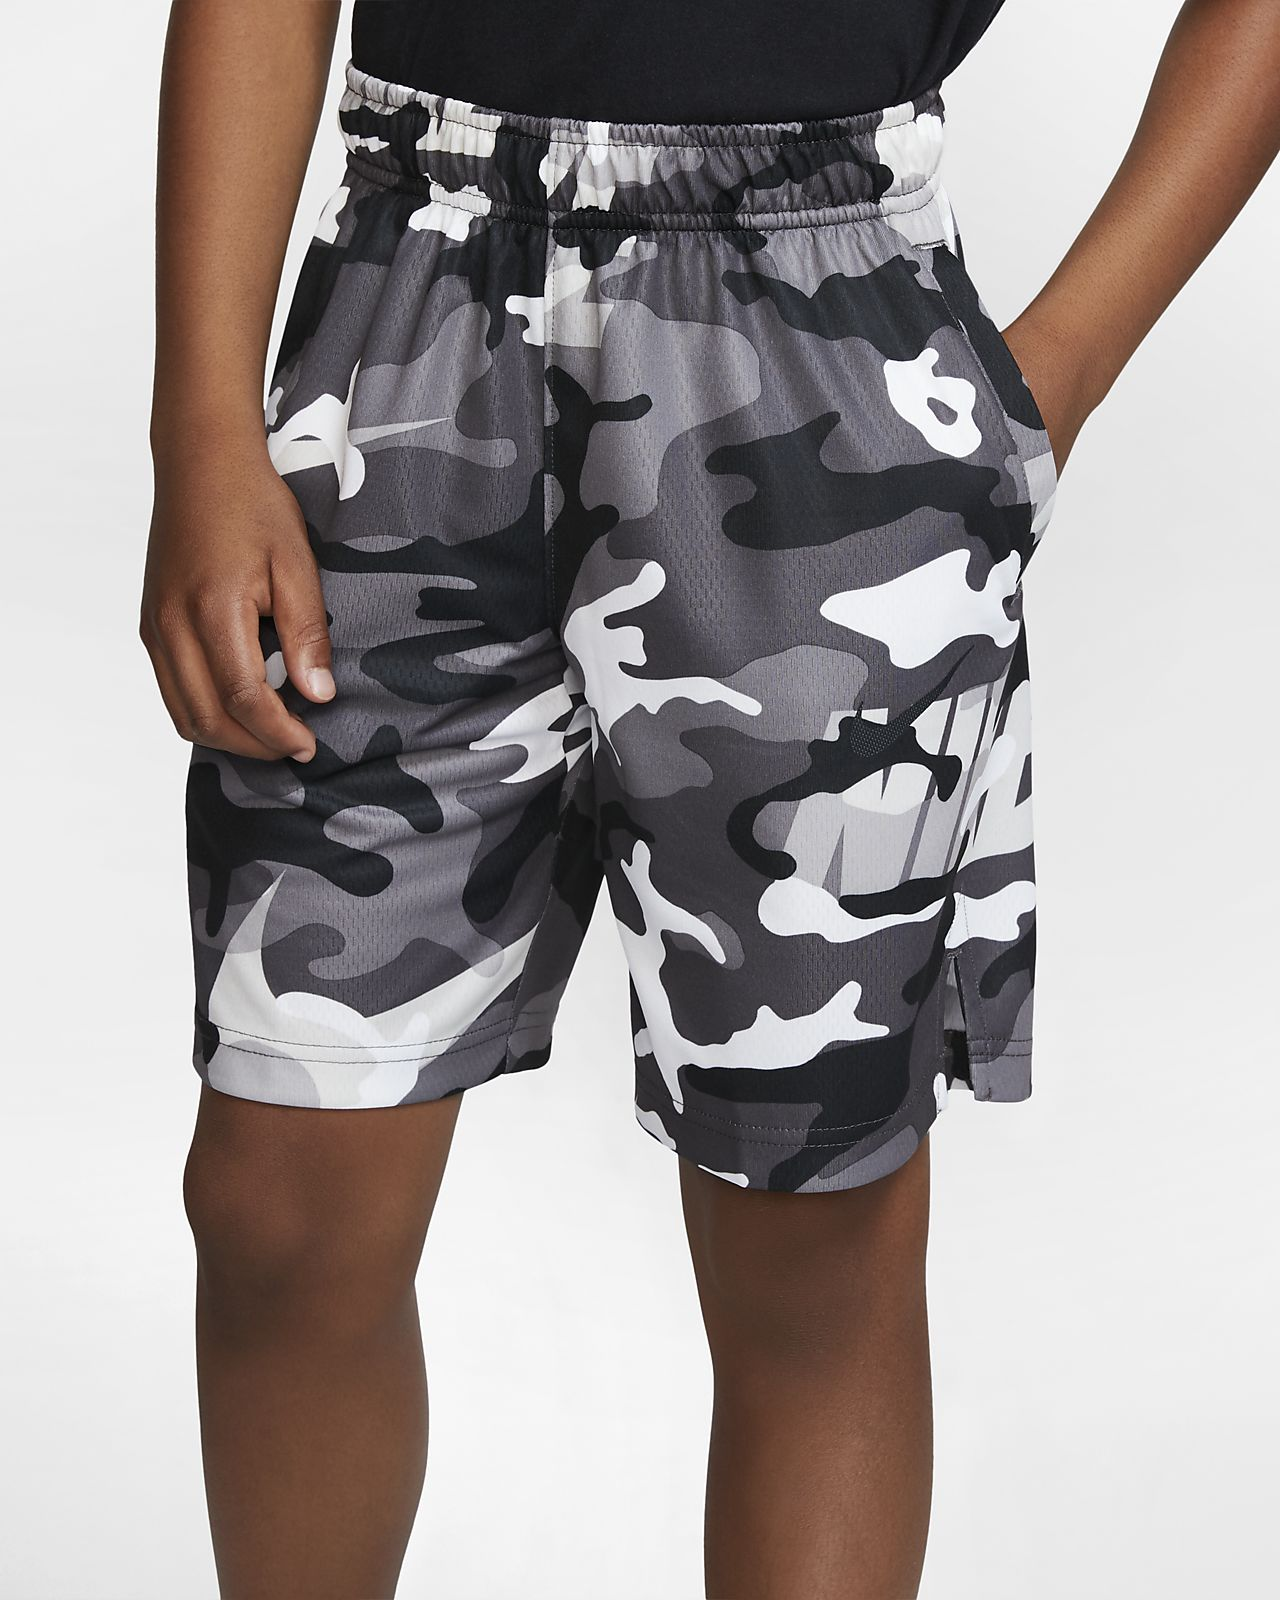 Chlapecké tréninkové kraťasy Nike Dri-FIT s maskáčovým motivem